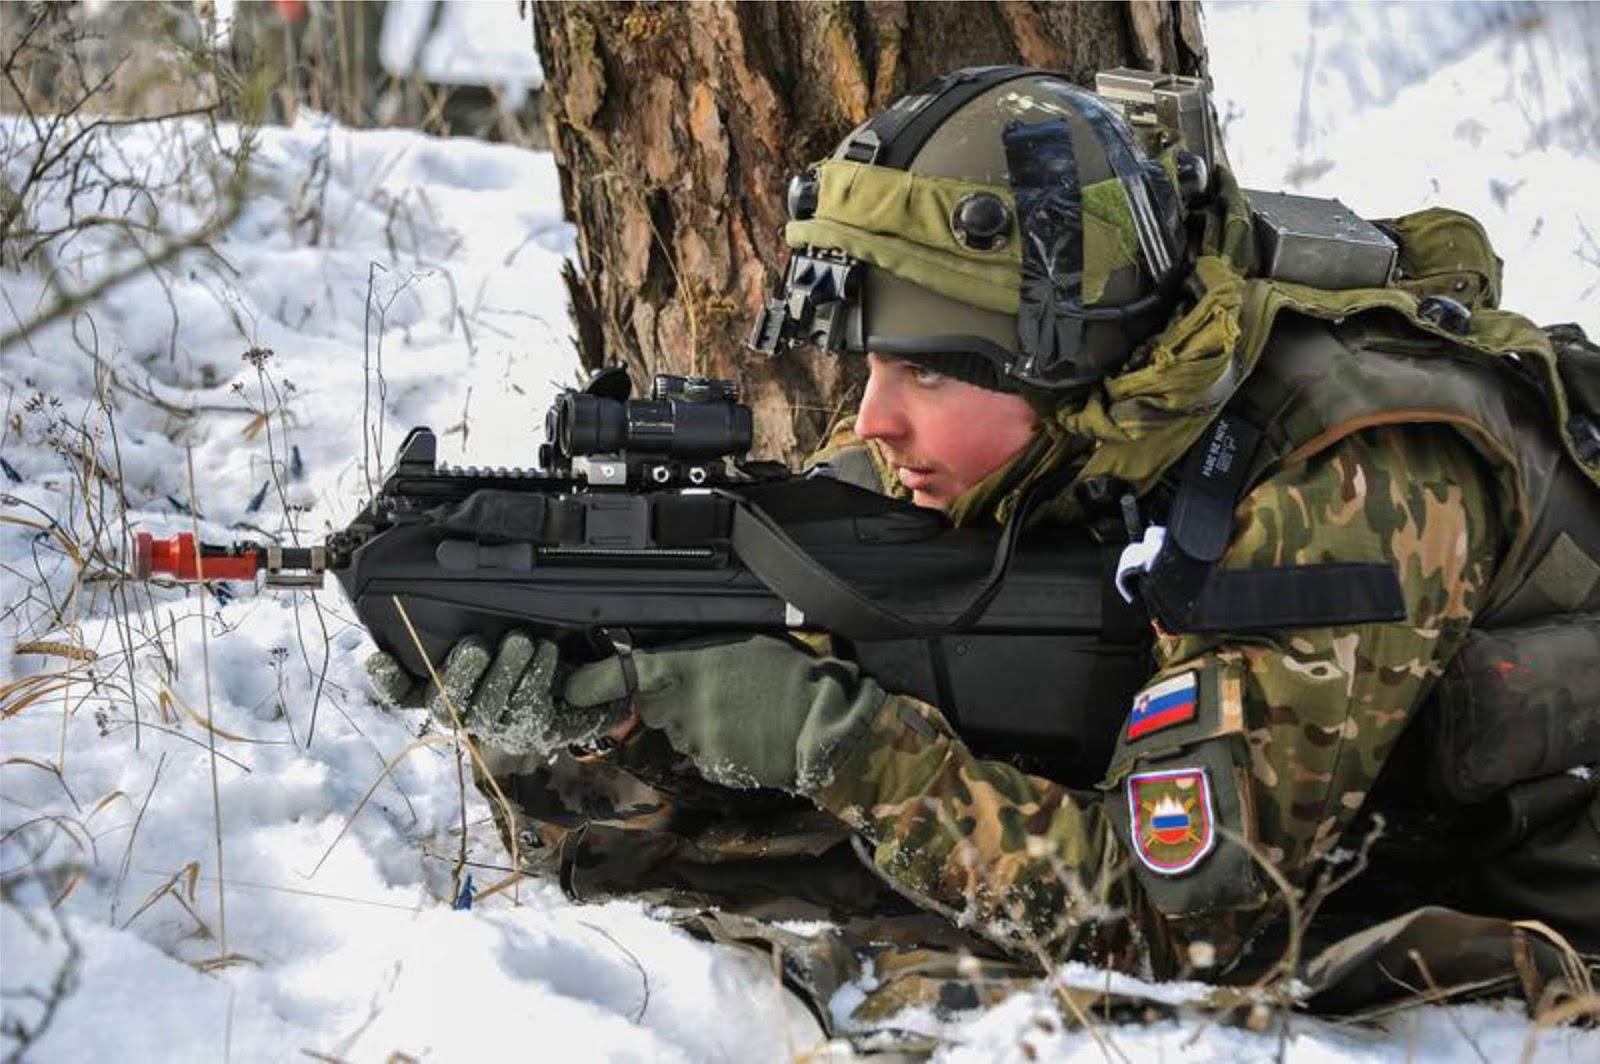 Tentara Slovenia kedinginan di manuver di Norwegia